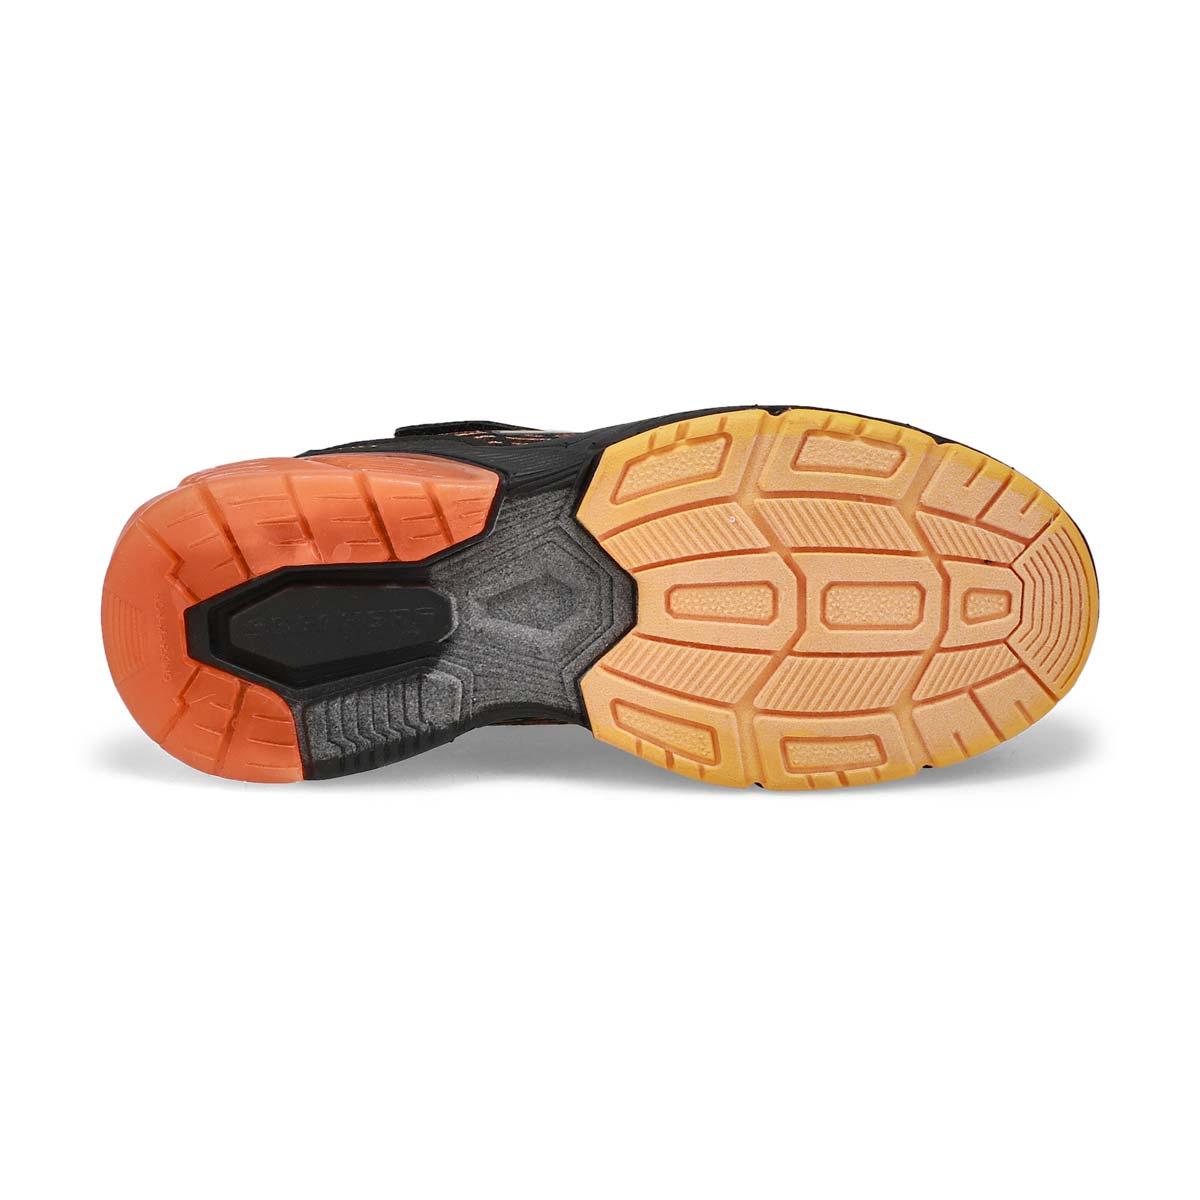 Boys' Thermoflux 2.0 Sneakers - Multi